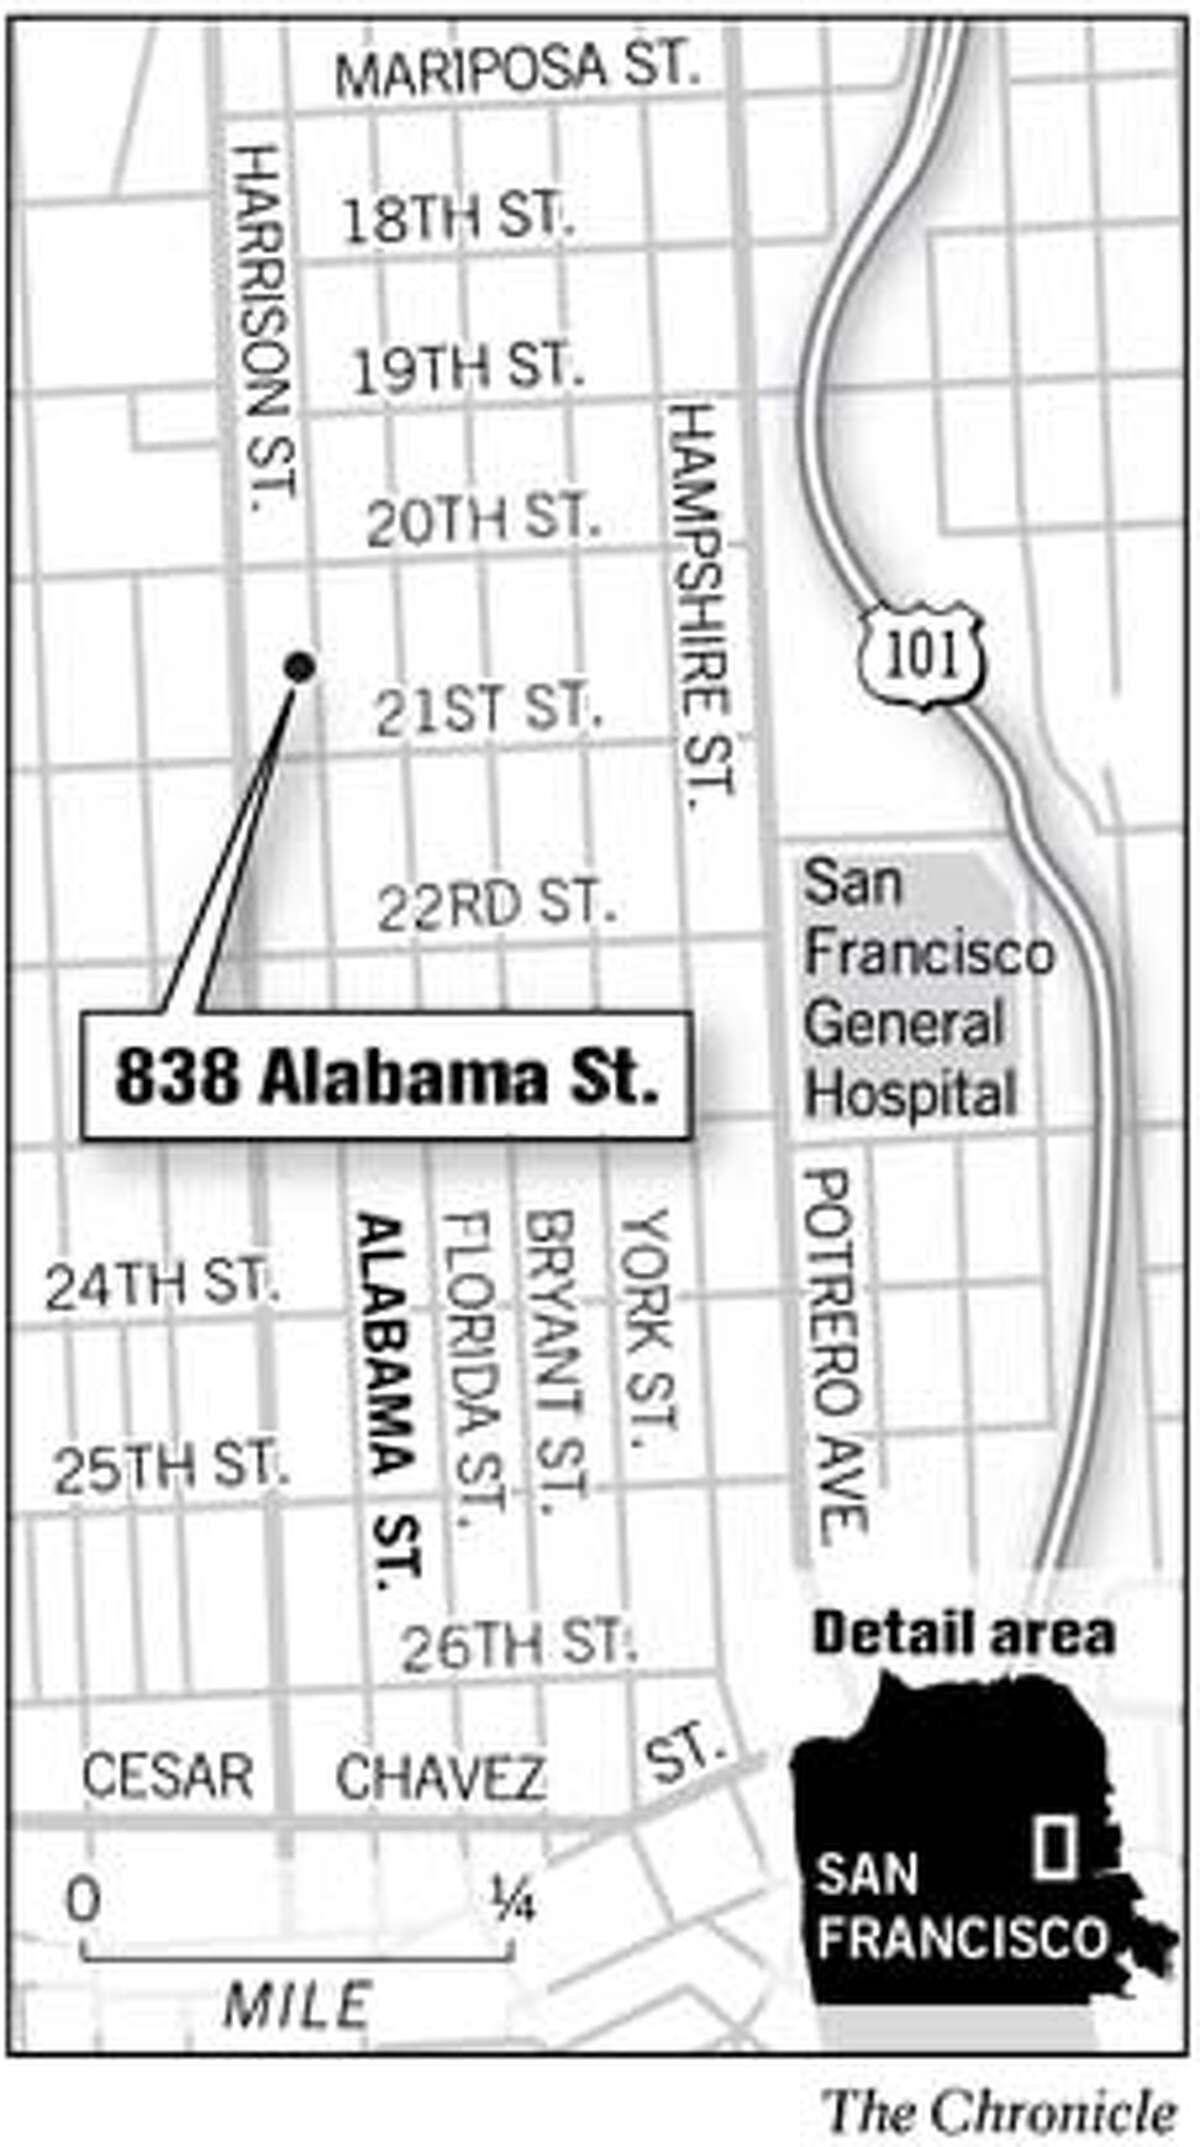 838 Alabama St. Chronicle Graphic